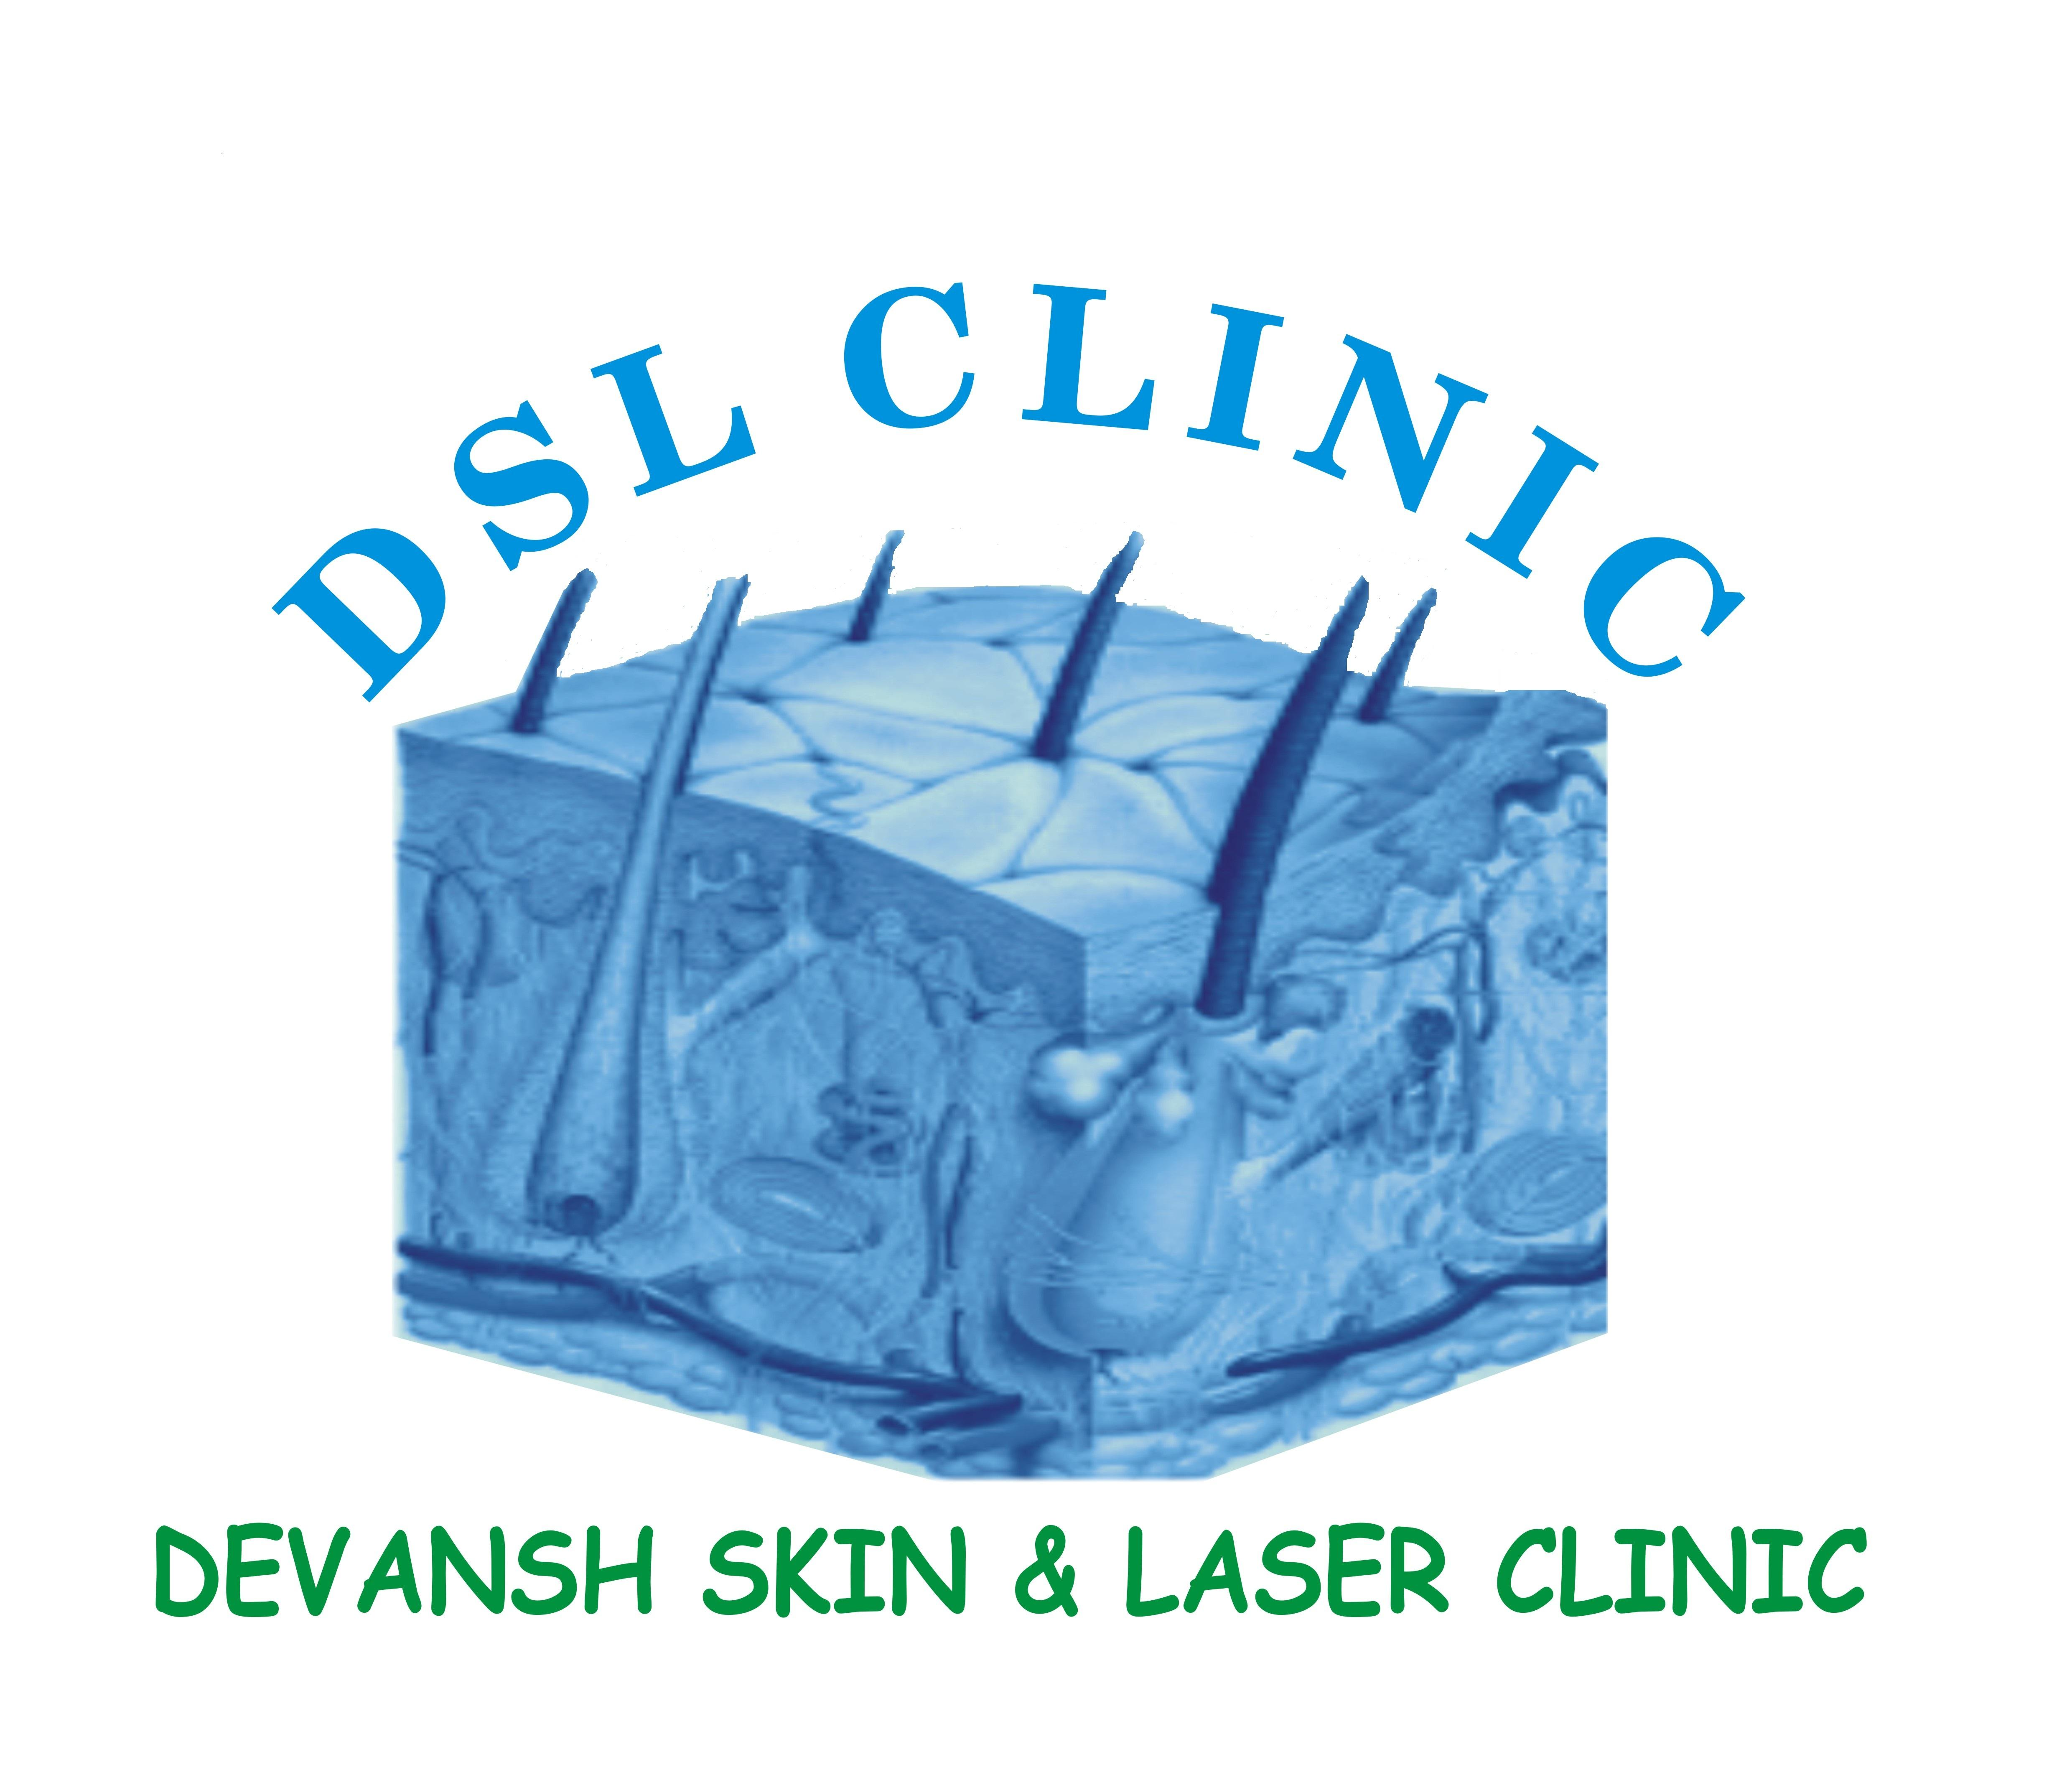 DSL Clinic - Devansh Skin And Laser Clinic